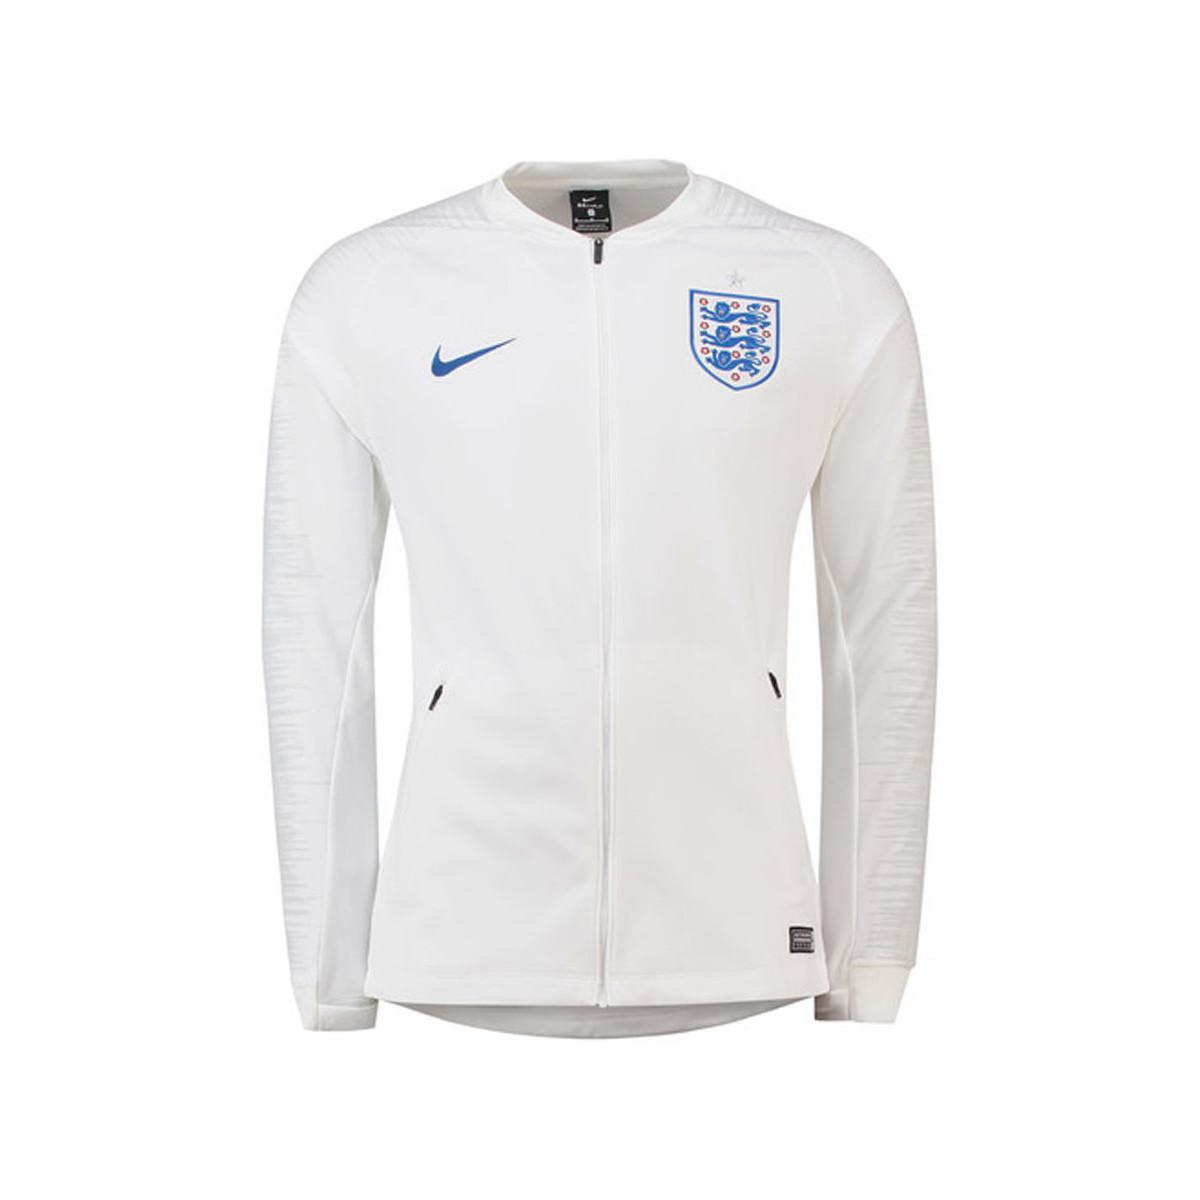 1cc070df28 Nike 2018-2019 England Anthem Jacket Men s Sweatshirt In White in ...